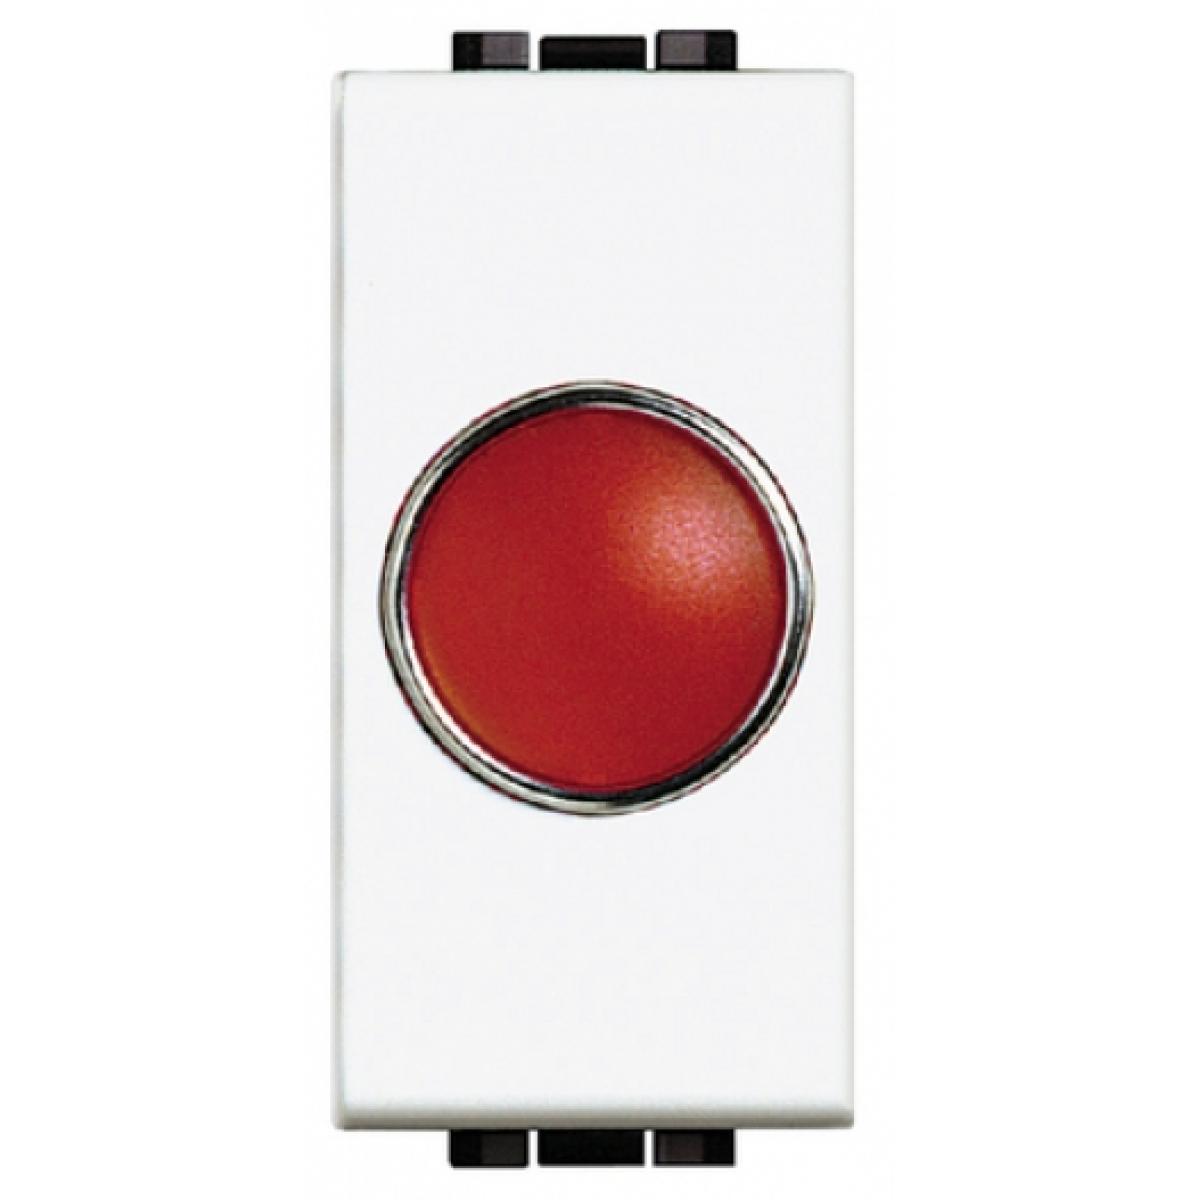 Portalampada Spia Rossa Bticino Living Light N4371R